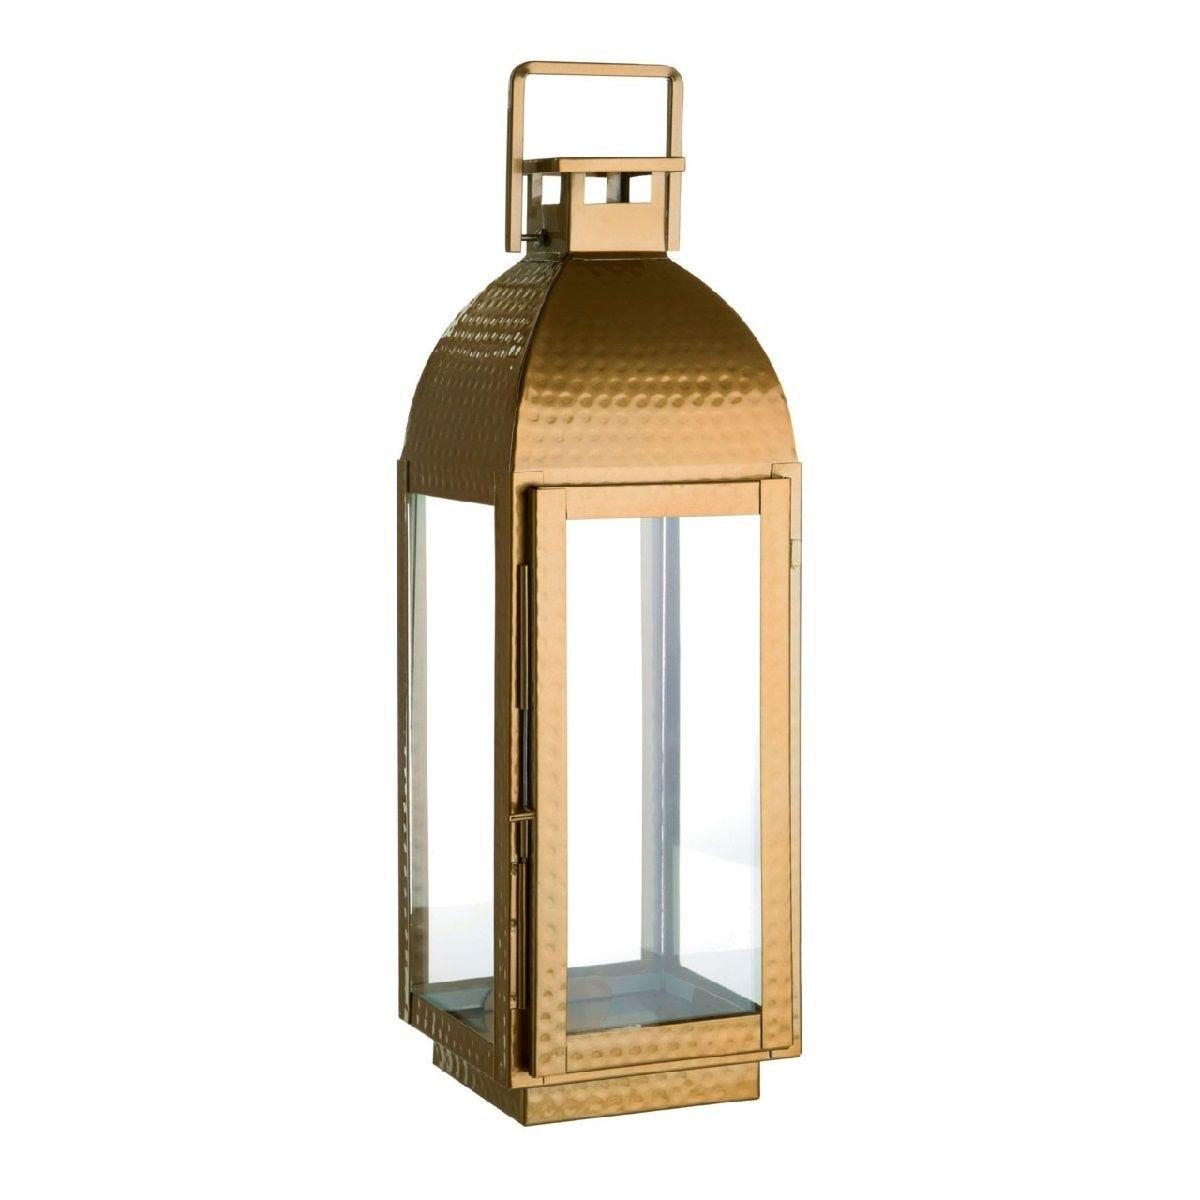 Premier Housewares Ravi Small Lantern in Stainless Steel/Glass - Brass Finish